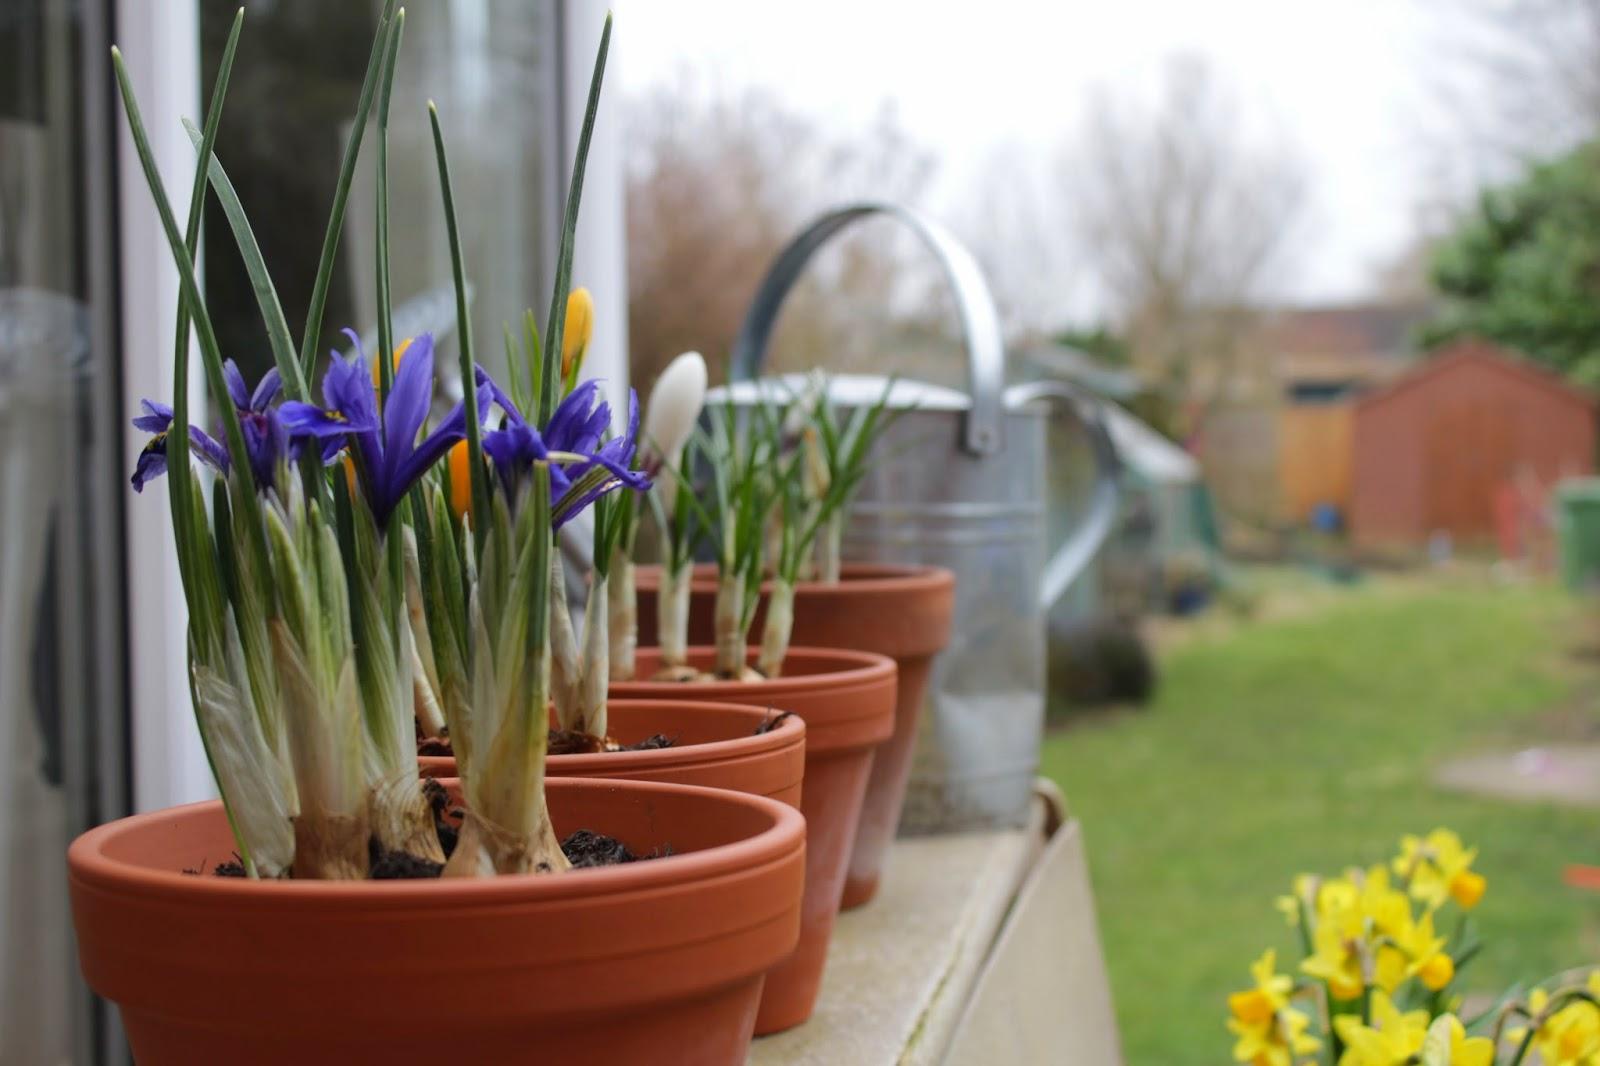 Iris & crocuses // 76sunflowers